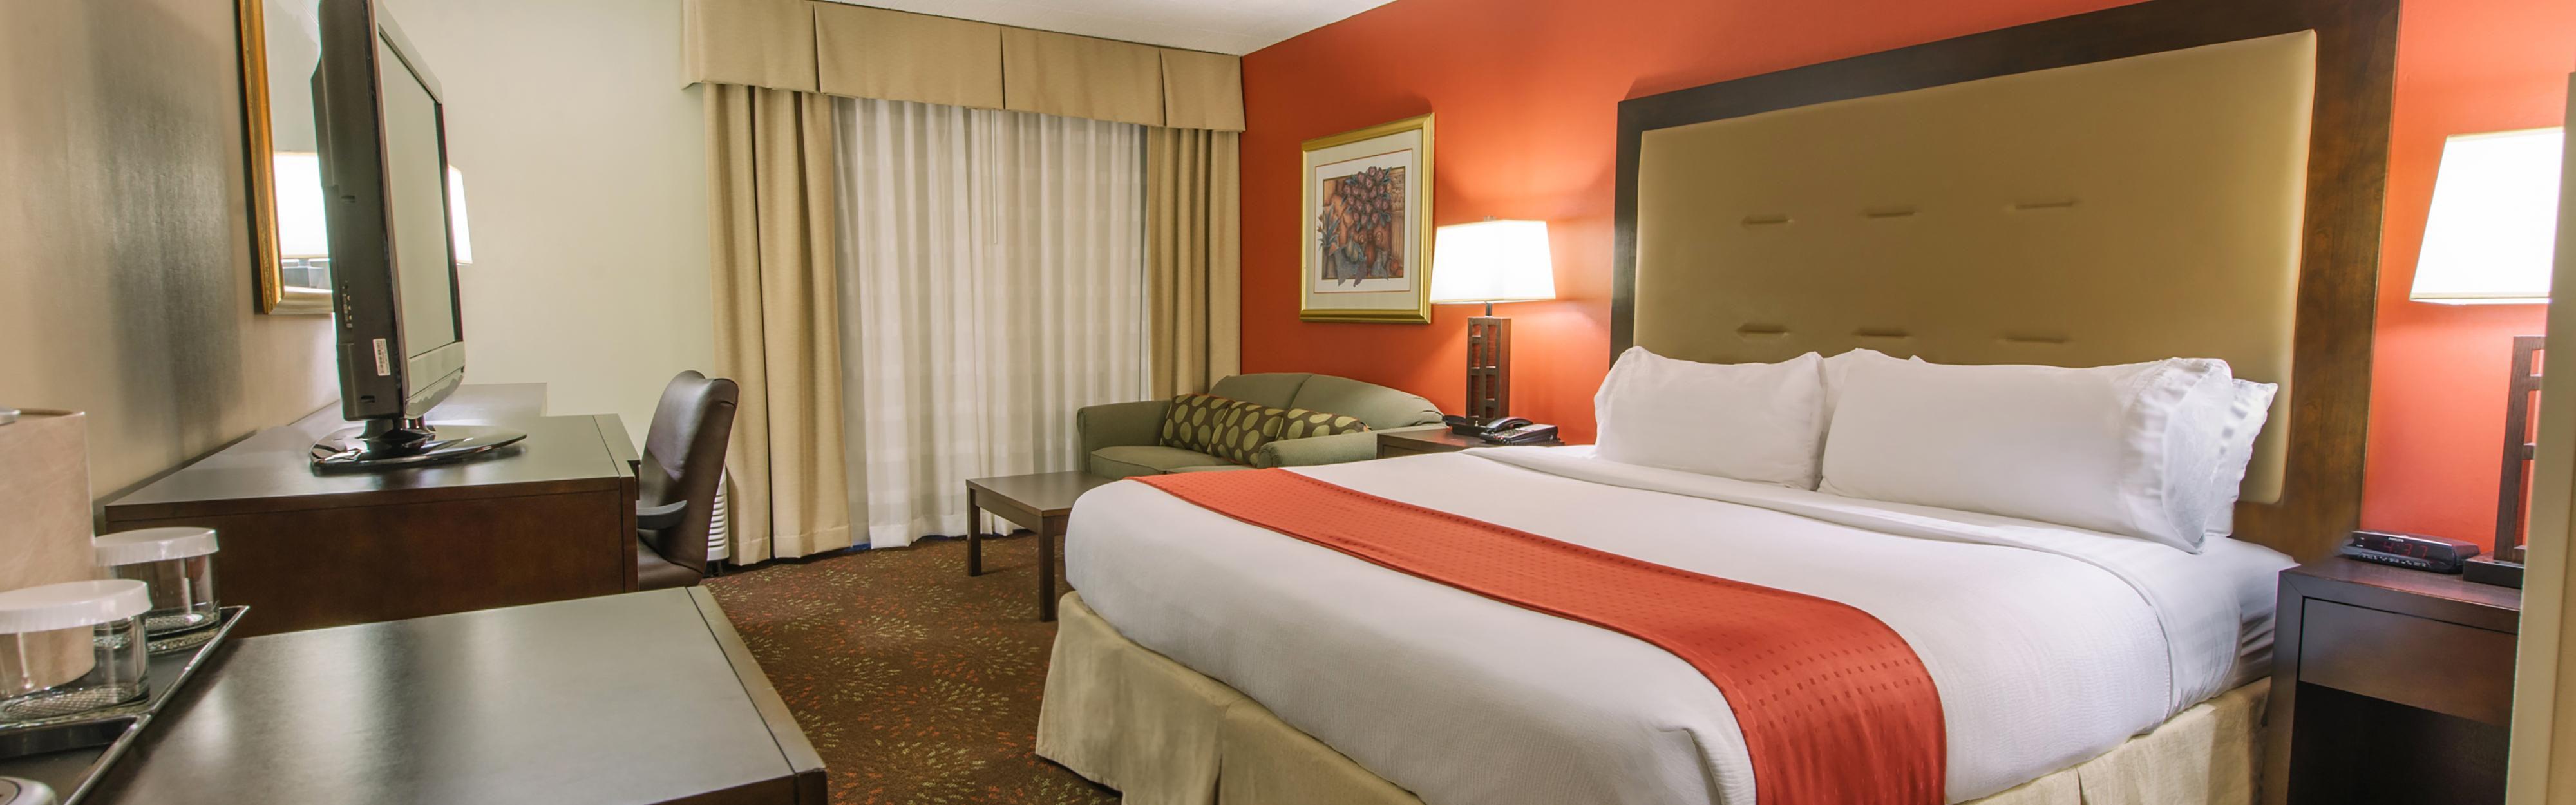 Holiday Inn Mt. Kisco (Westchester County)